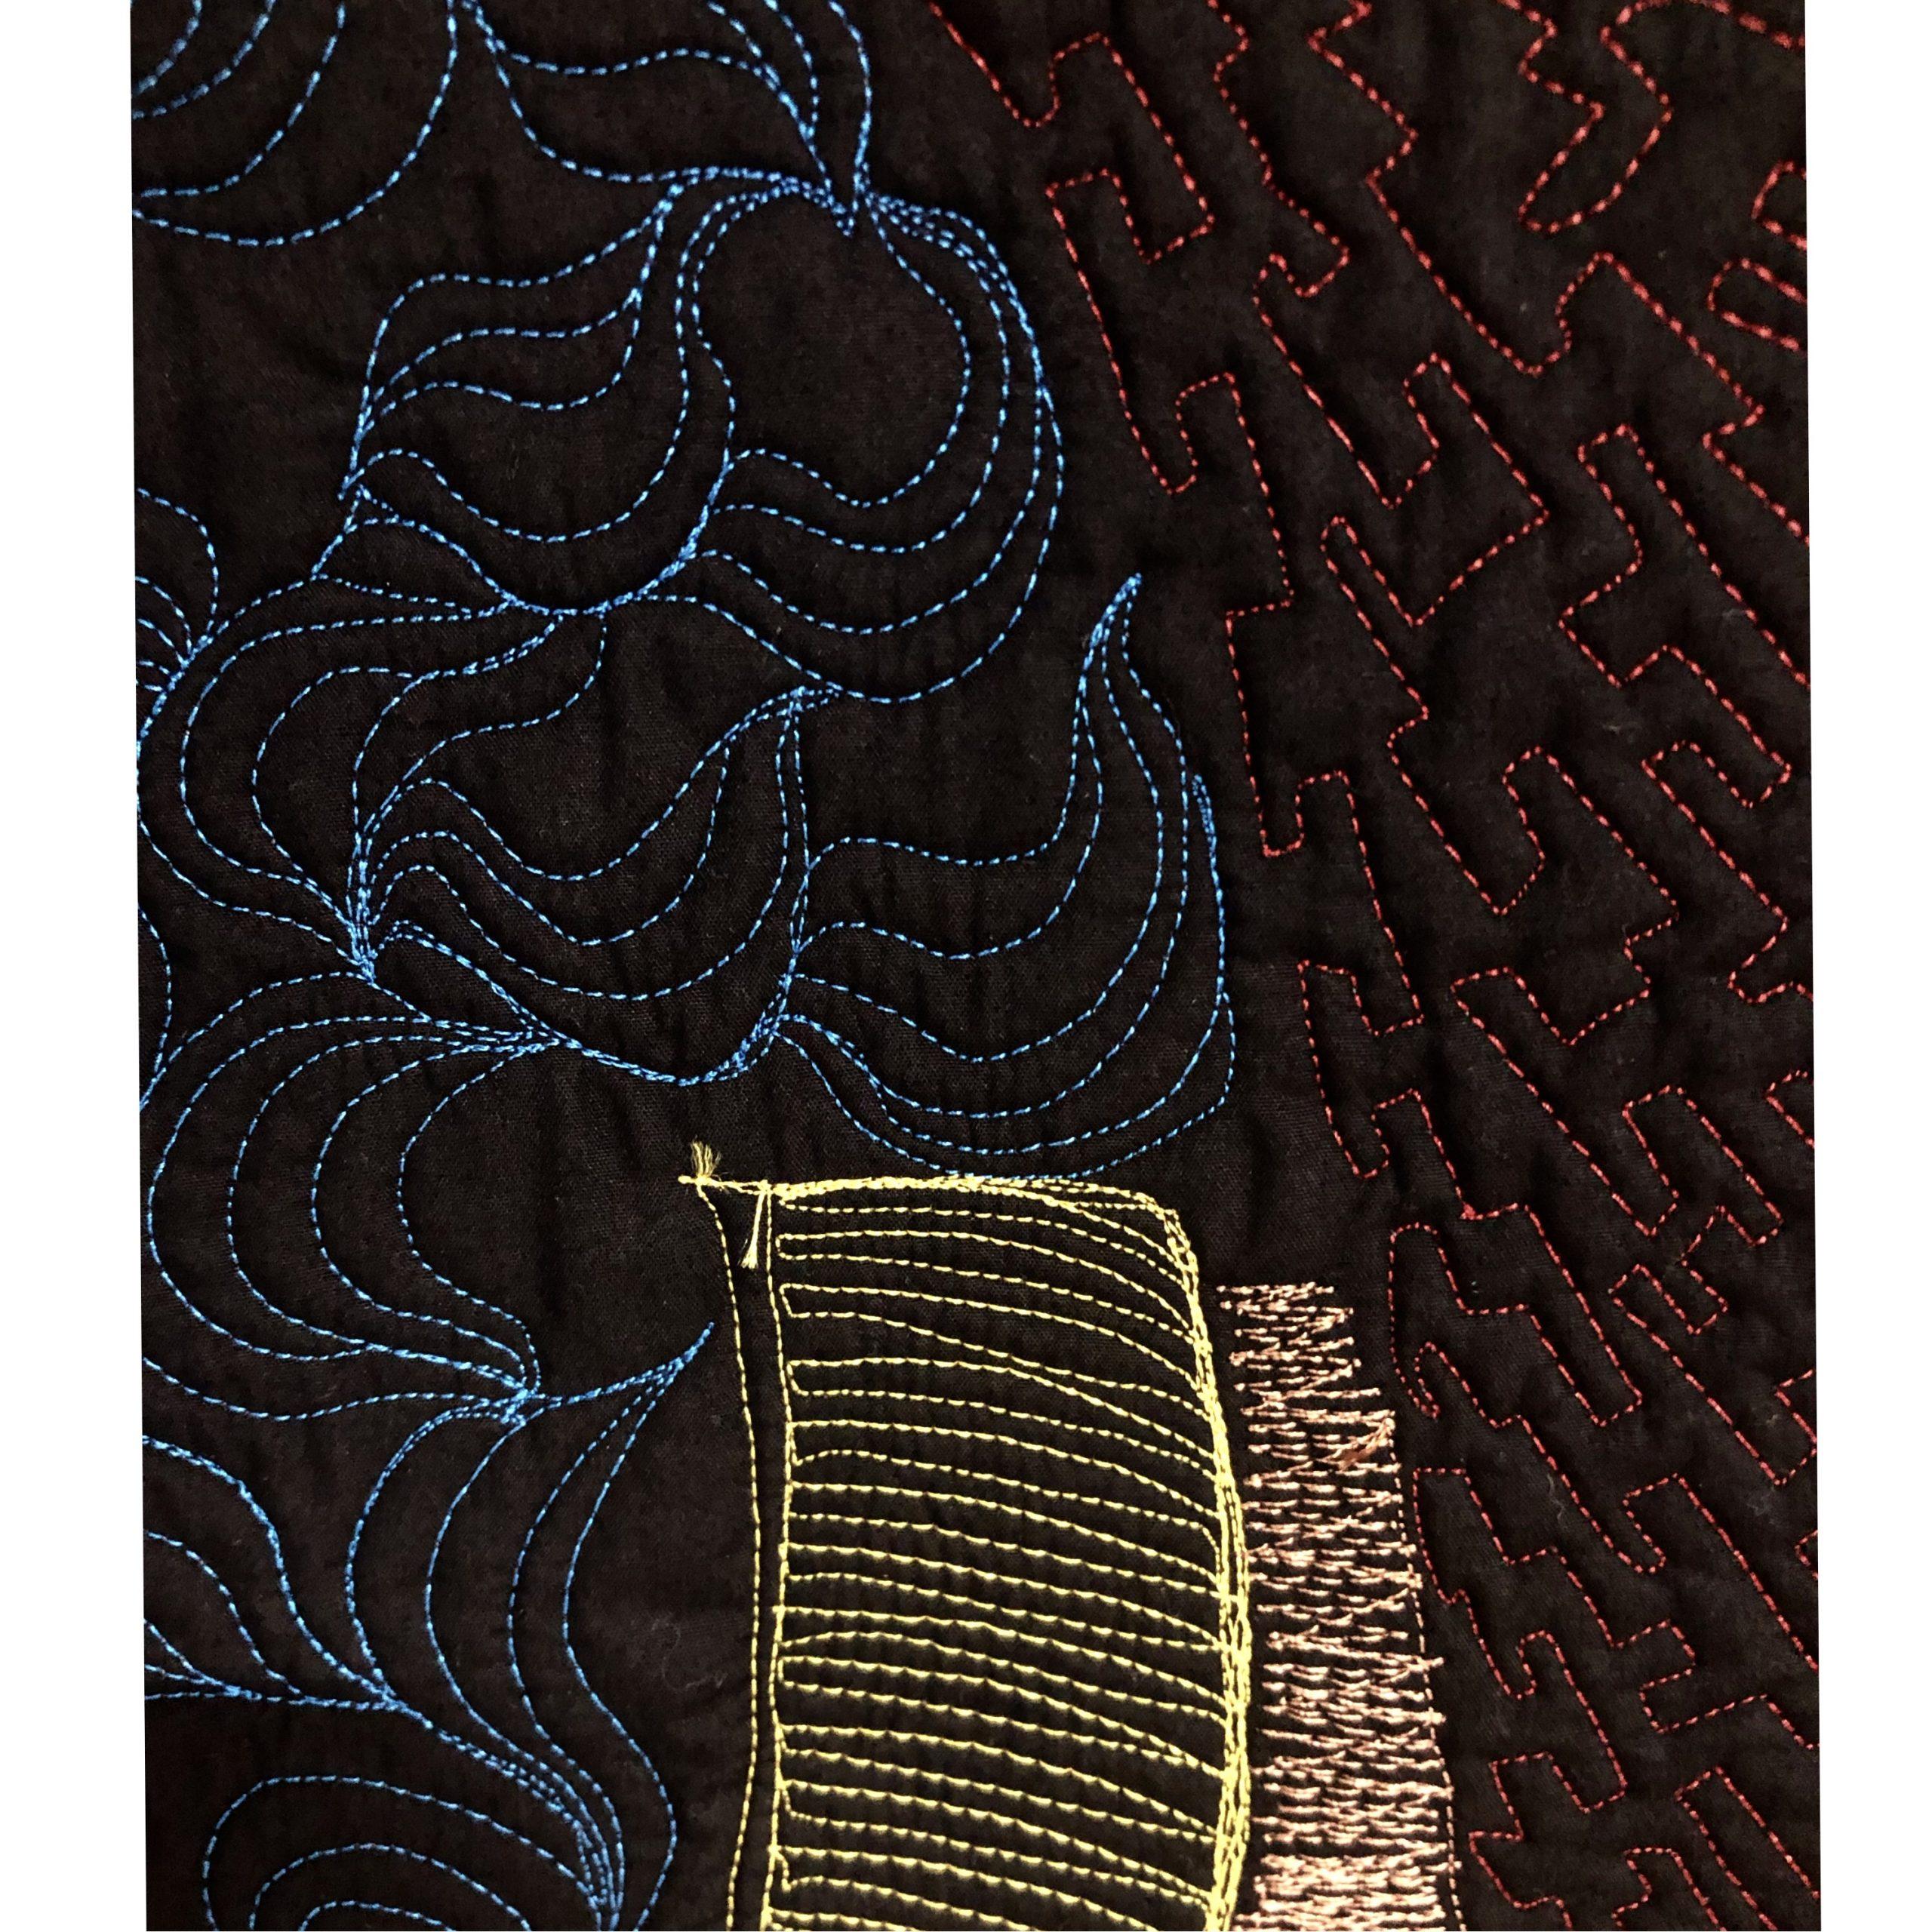 Thread Painting | Thread Sketching |Fiber Art